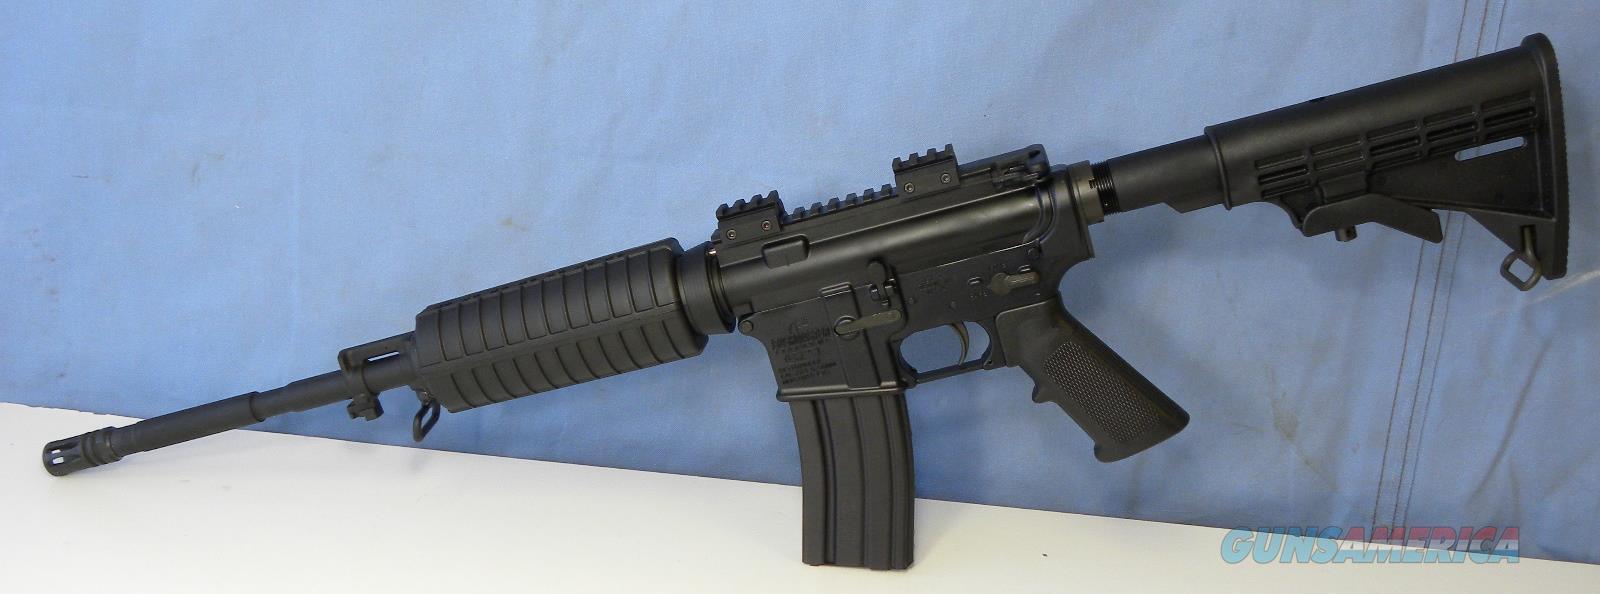 Bushmaster XM15 Optics Ready Carbine   Guns > Rifles > Bushmaster Rifles > Complete Rifles